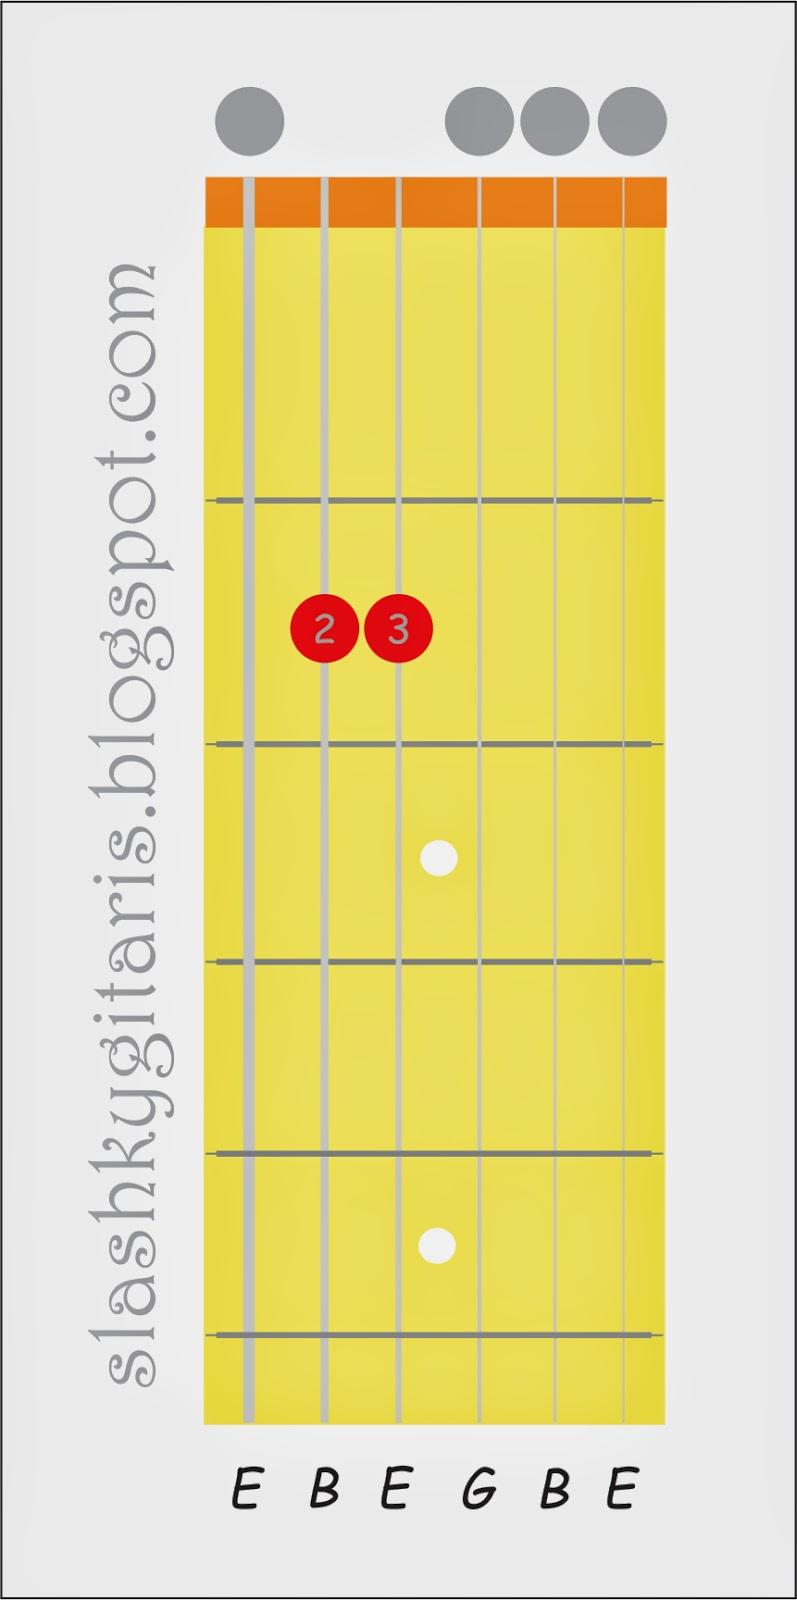 belajar chord gitar, belajar gitar, belajar gitar pemula, chord dasar, chord gitar, chord major, kunci gitar, kunci gitar E mayor, Kunci gitar E minor